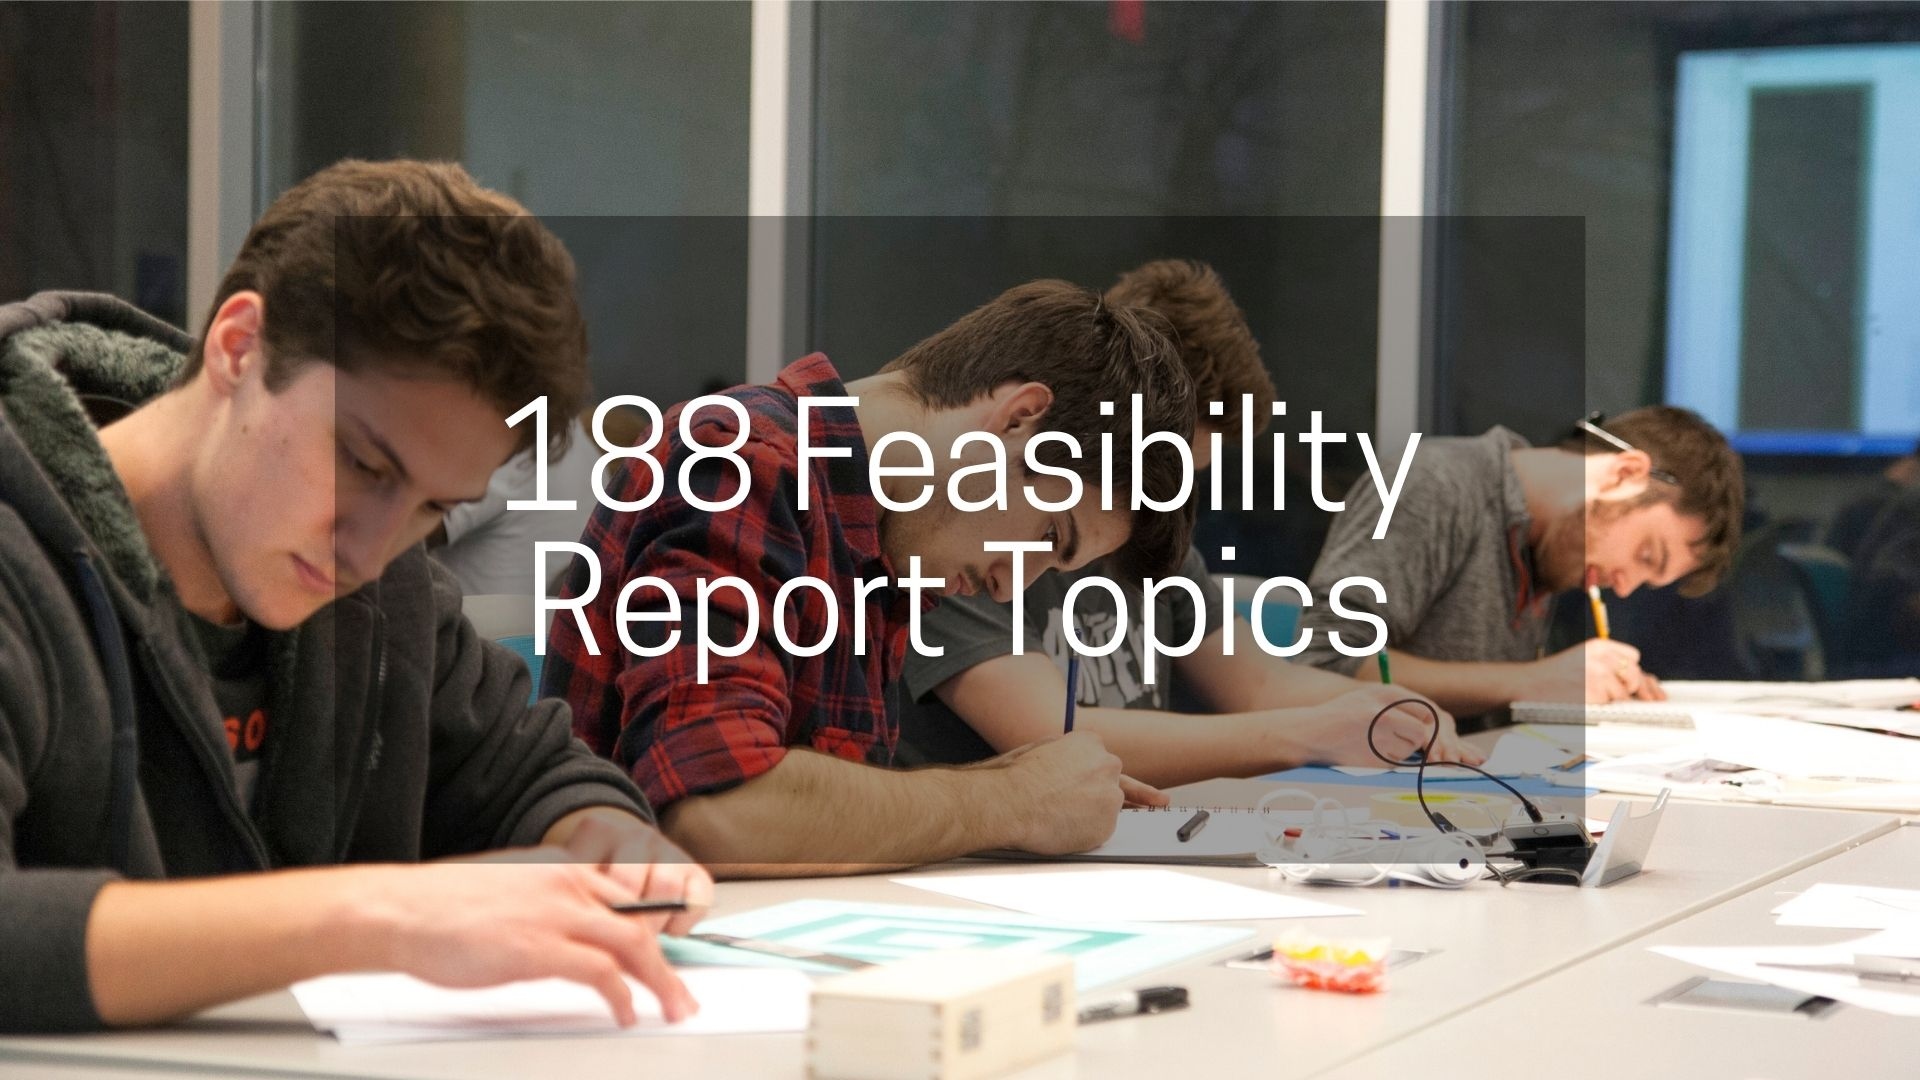 feasibility Report Topics